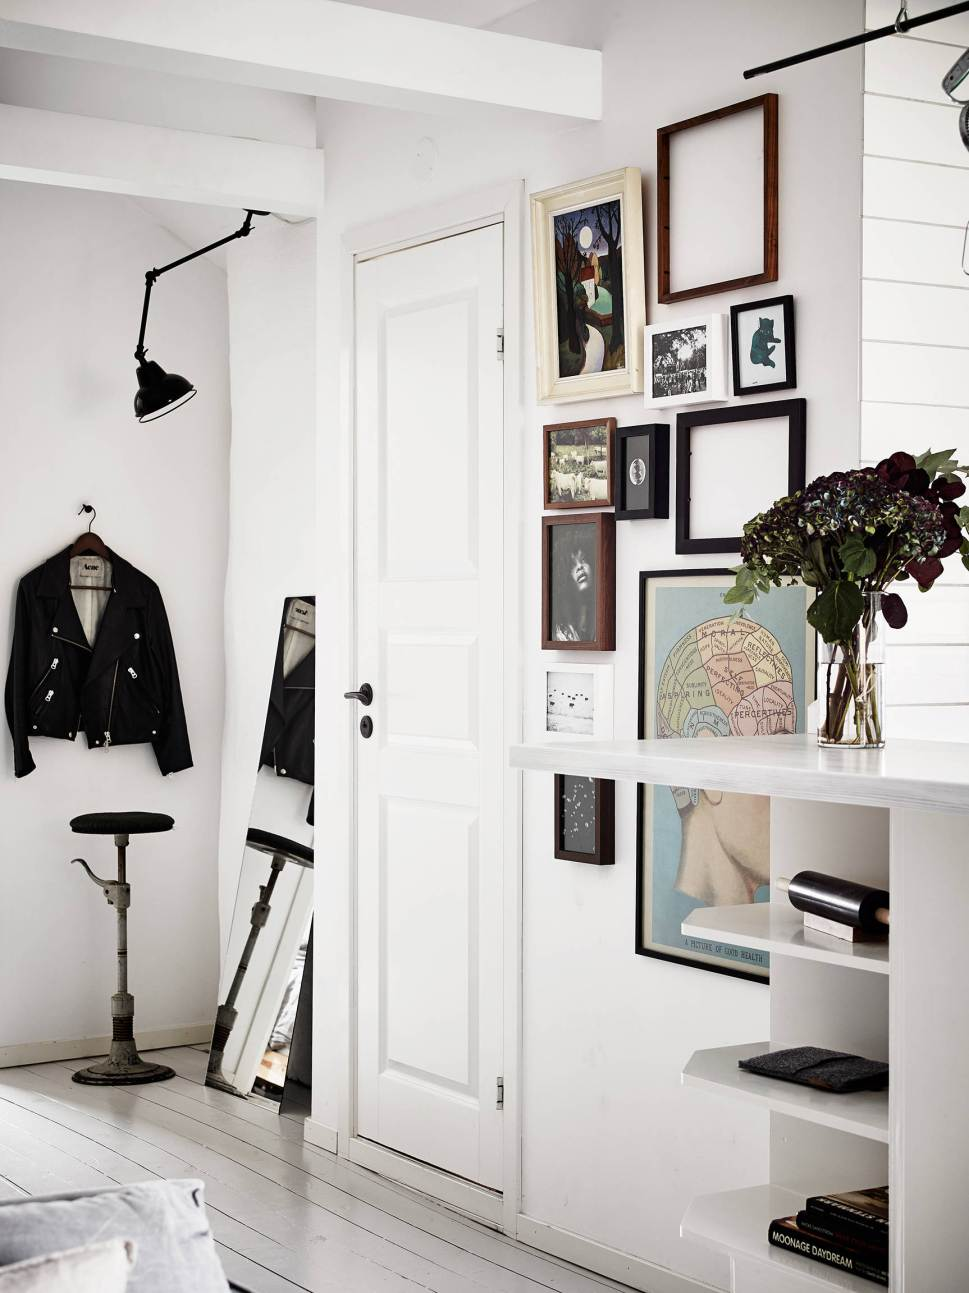 Il faut qu 39 une porte soit ouverte ou ferm e planete for Como decorar entrada piso